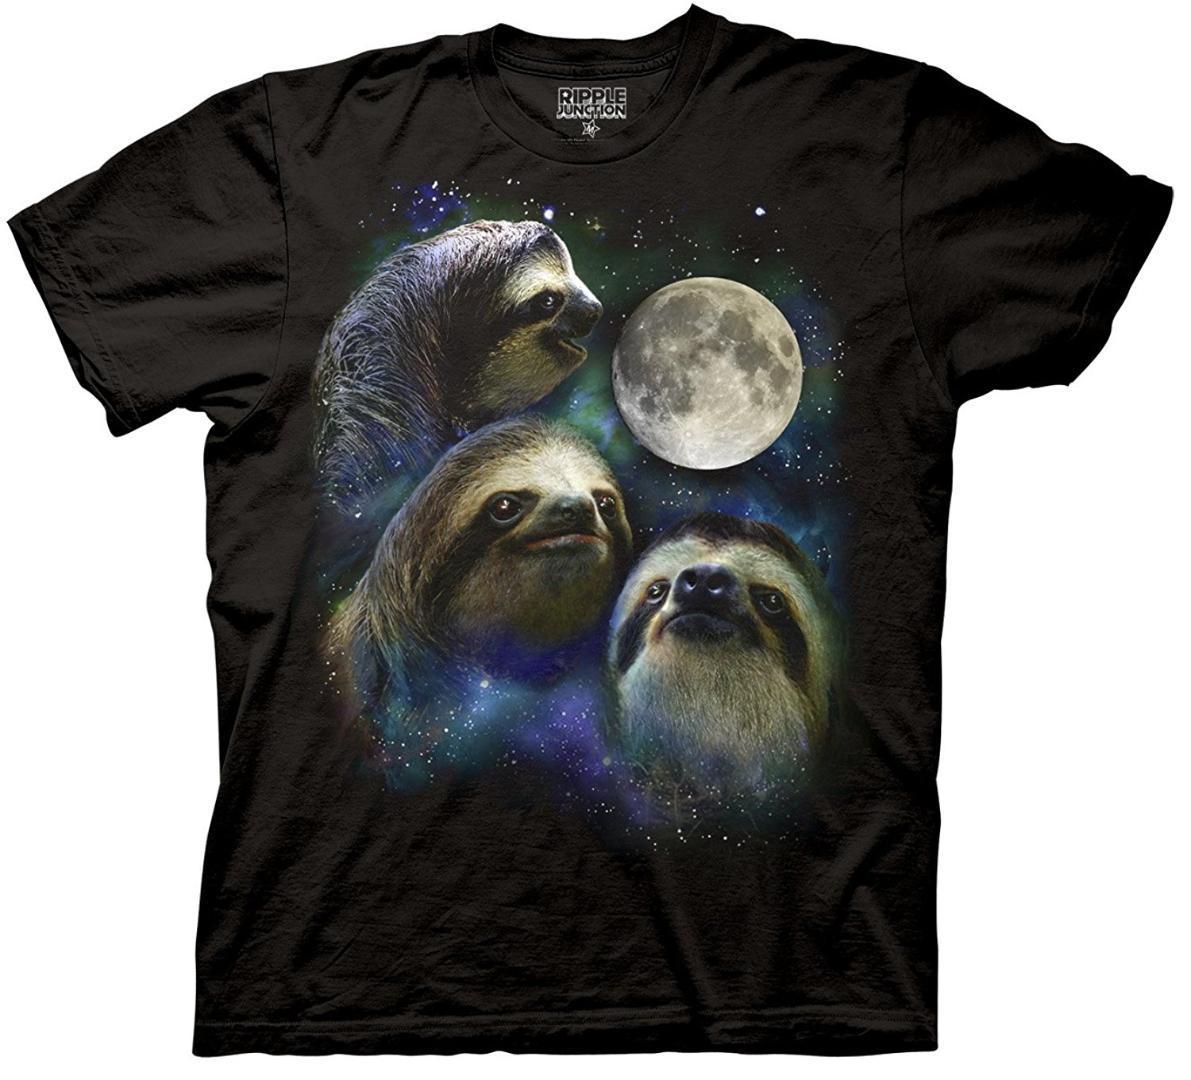 0121a83acb4 Three Wolf Moon Shirt Parody Three Sloth Moon Shirt 100% Cotton T Tee T  Shirts Shopping Really Funny T Shirts From Tutucloth